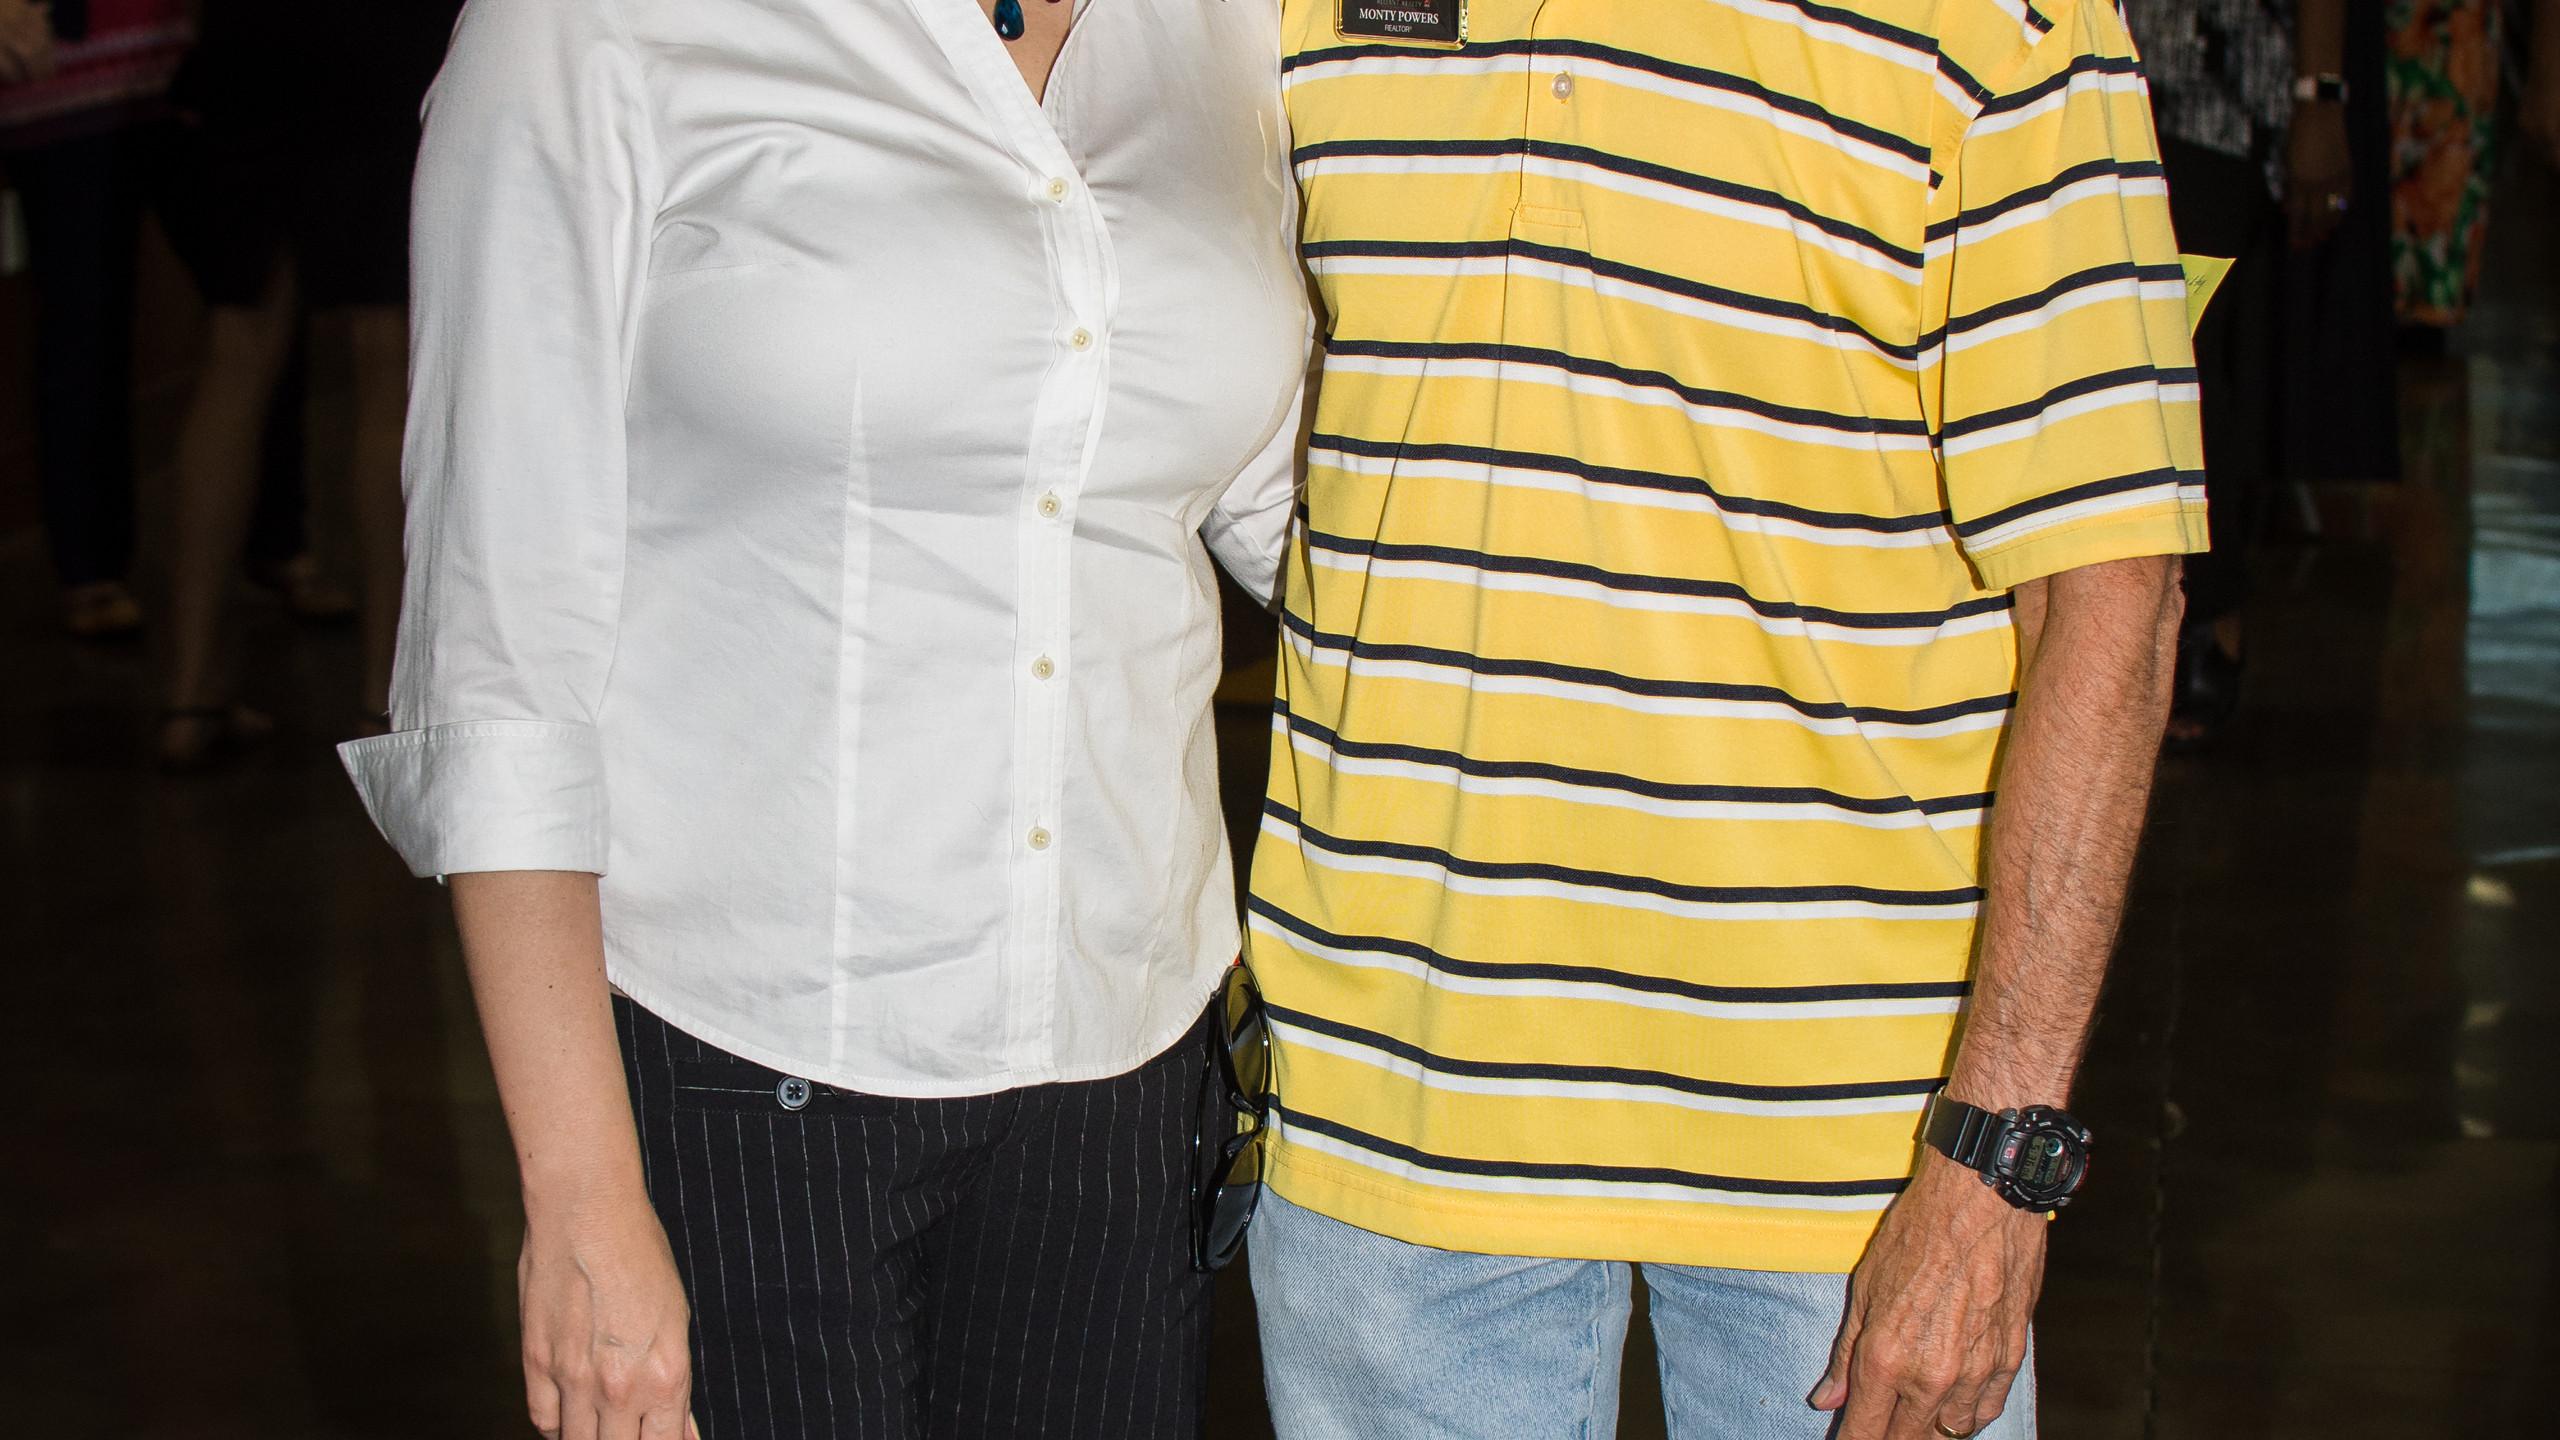 Gazelle Westermeyer and Monty Owens